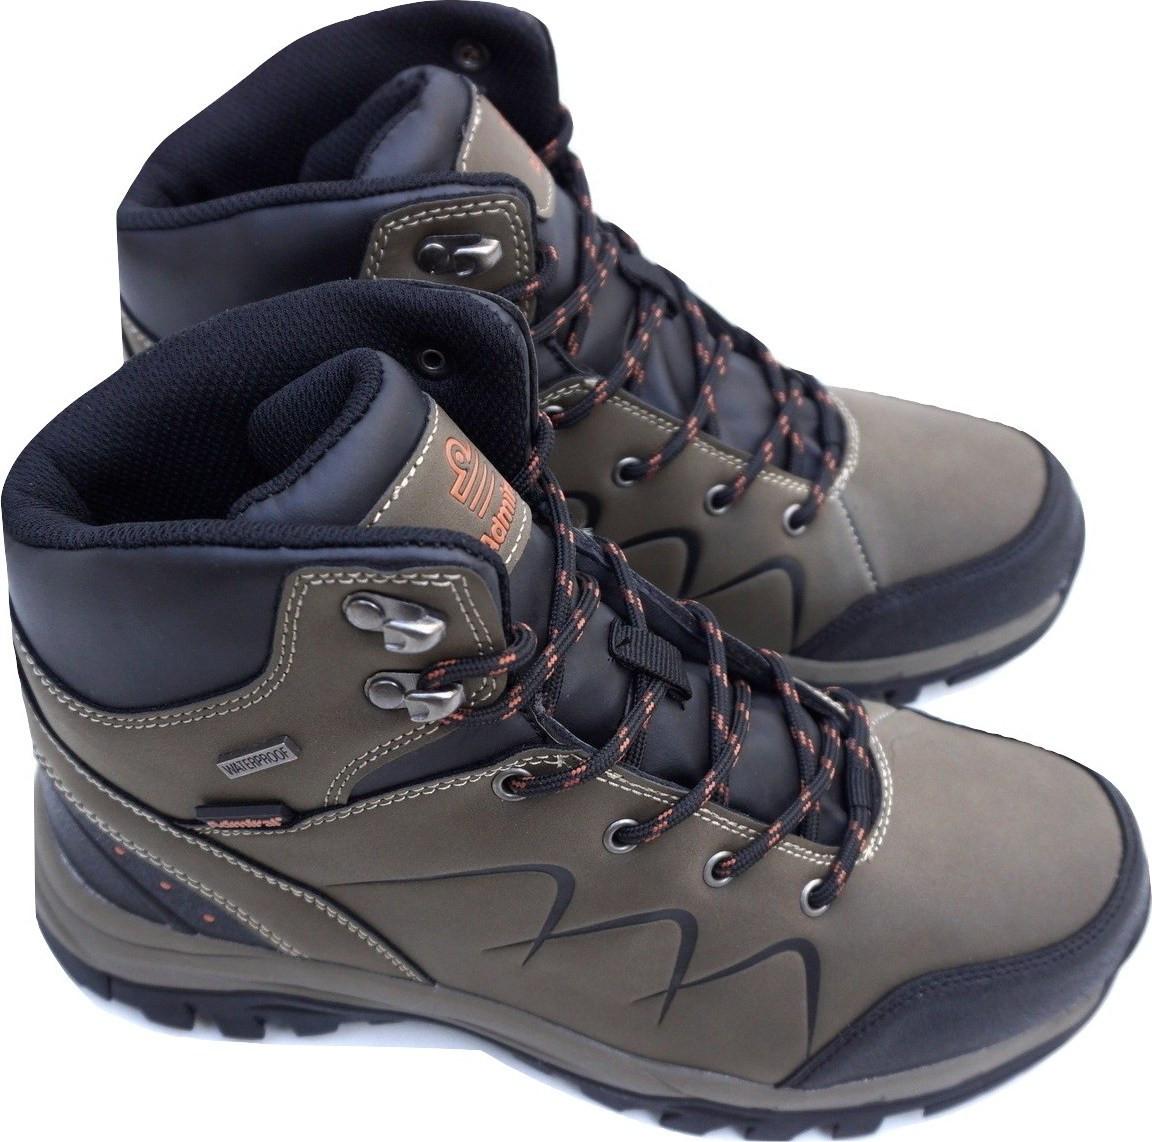 a24b277eb6e4 Ανδρικά Ορειβατικά Παπούτσια Admiral